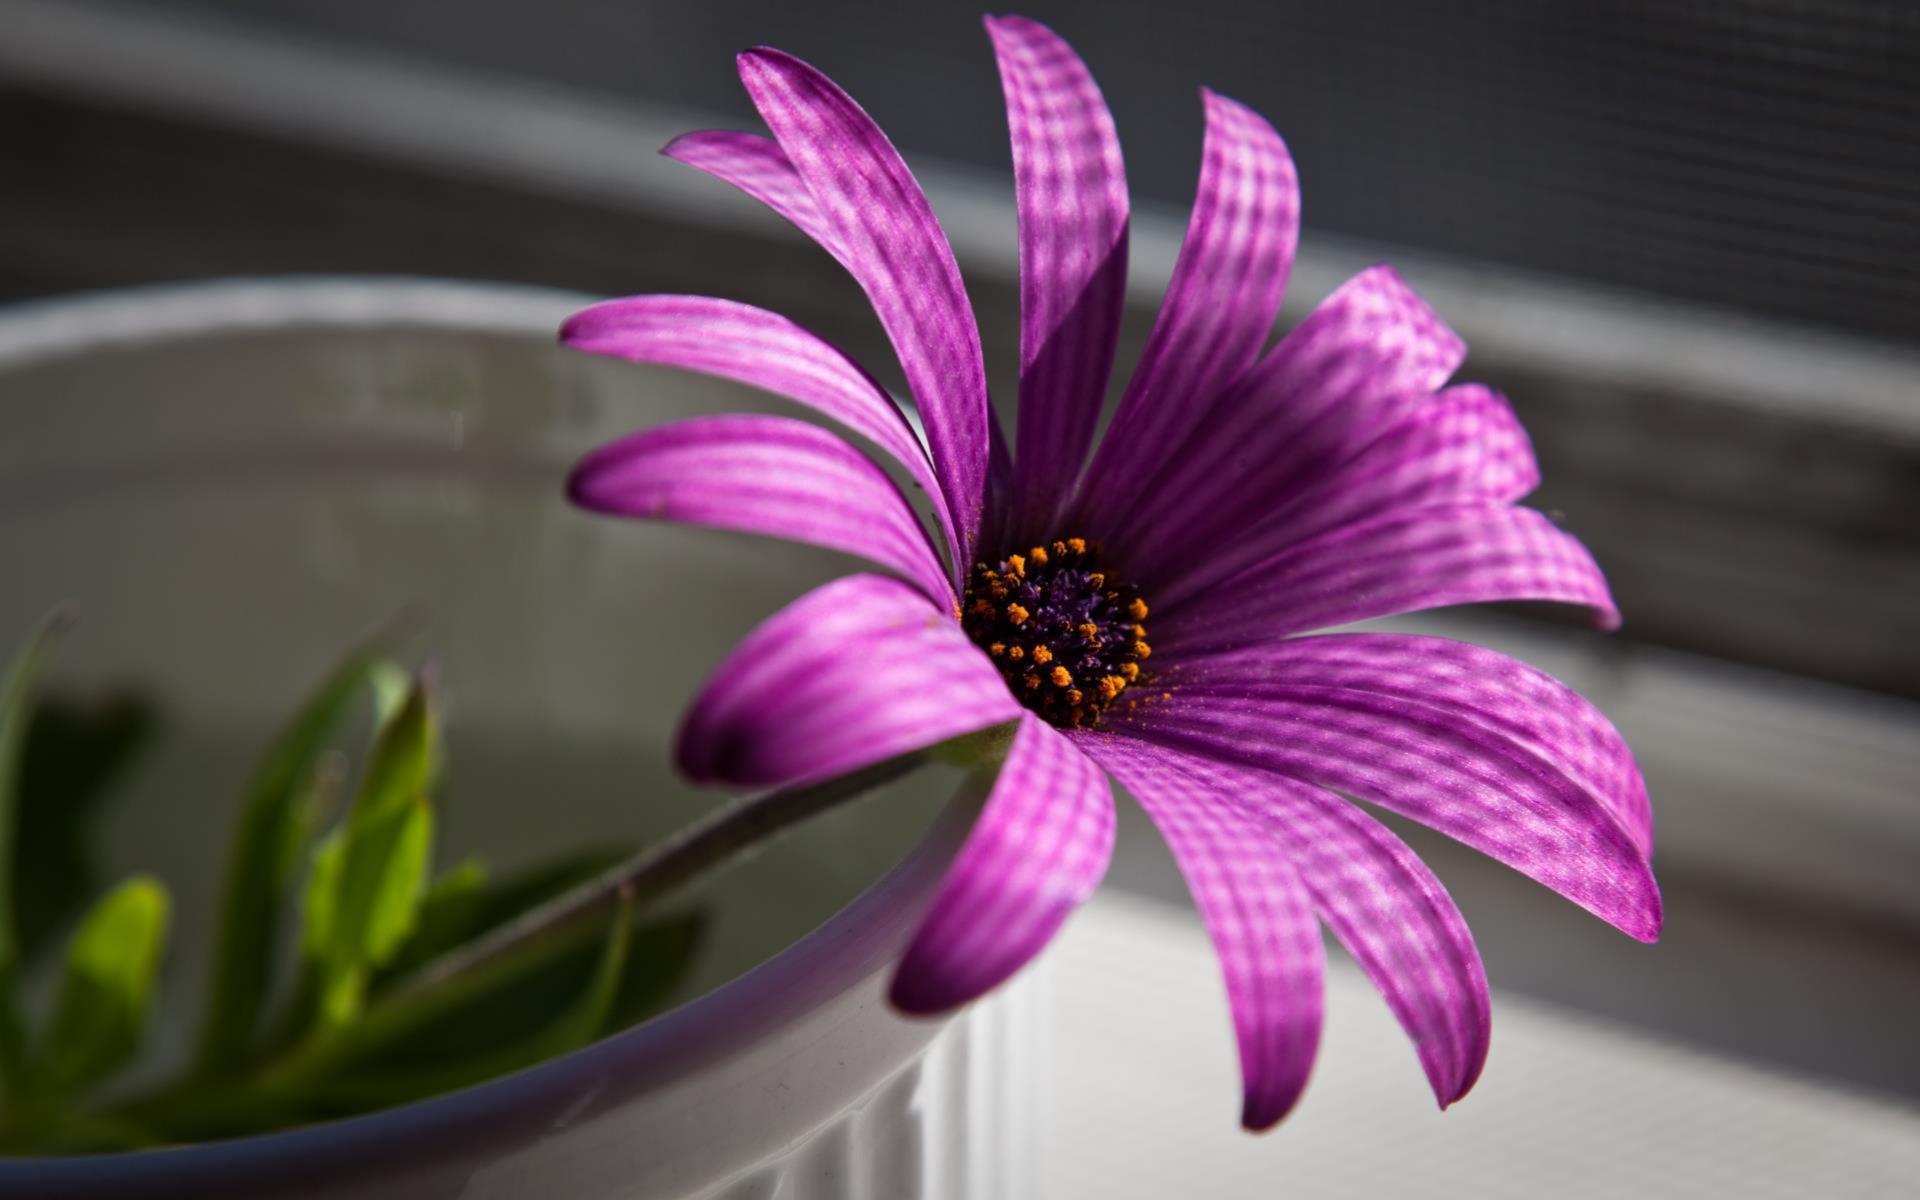 fleurs-en-fonds-ecran-HD-a-telecharger-gratuitement_2